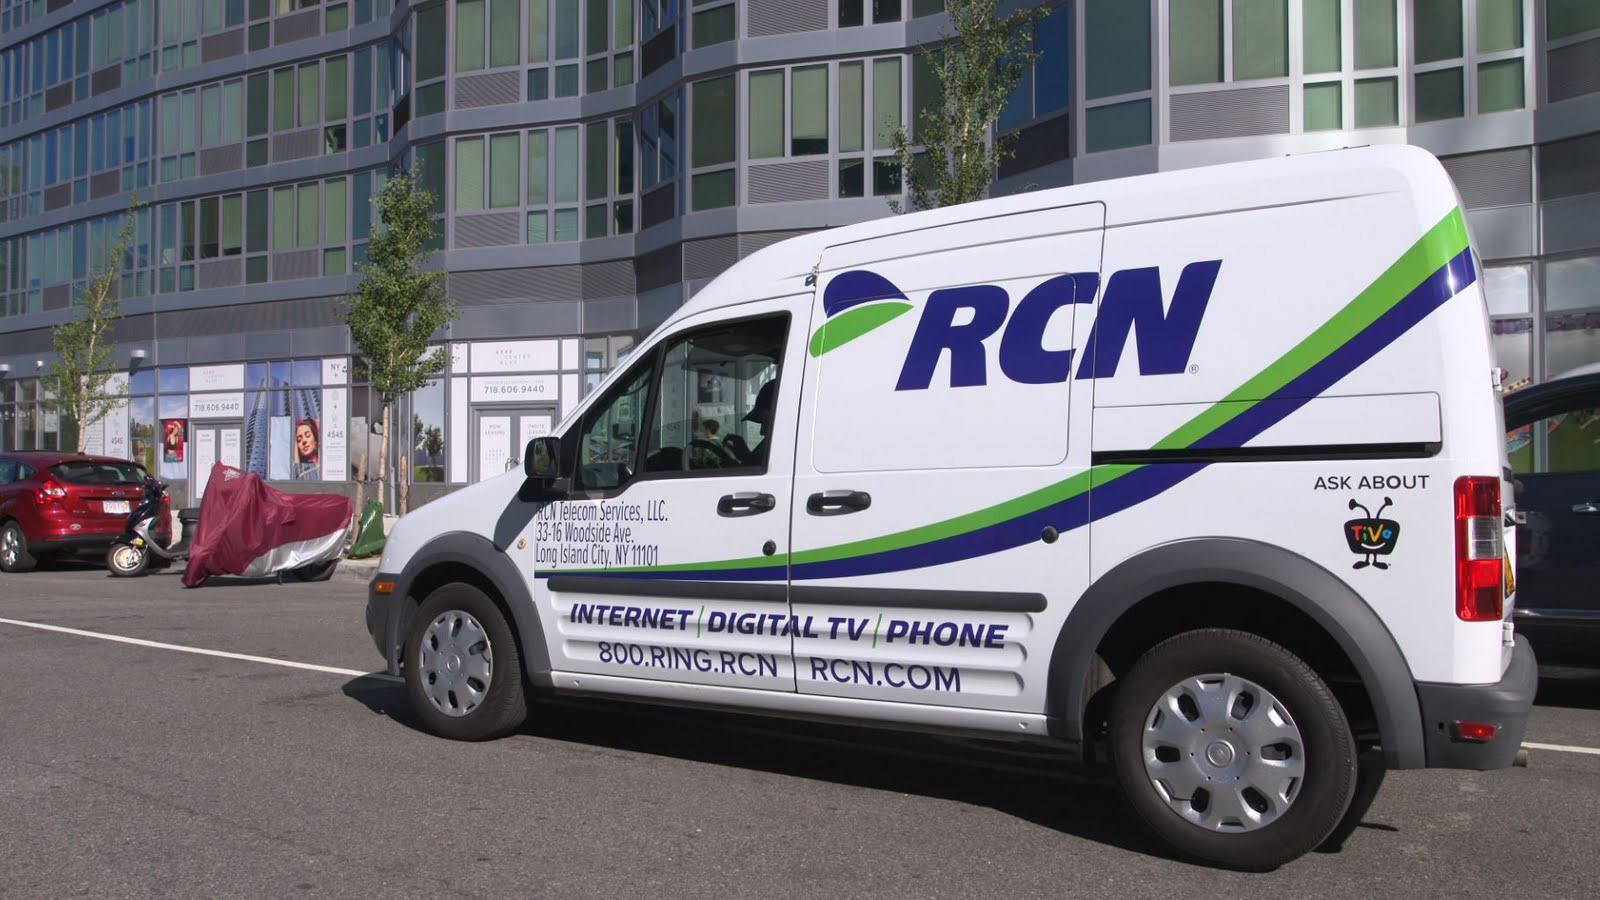 RCN at 3734 10th St, NE, Washington, DC on Fave